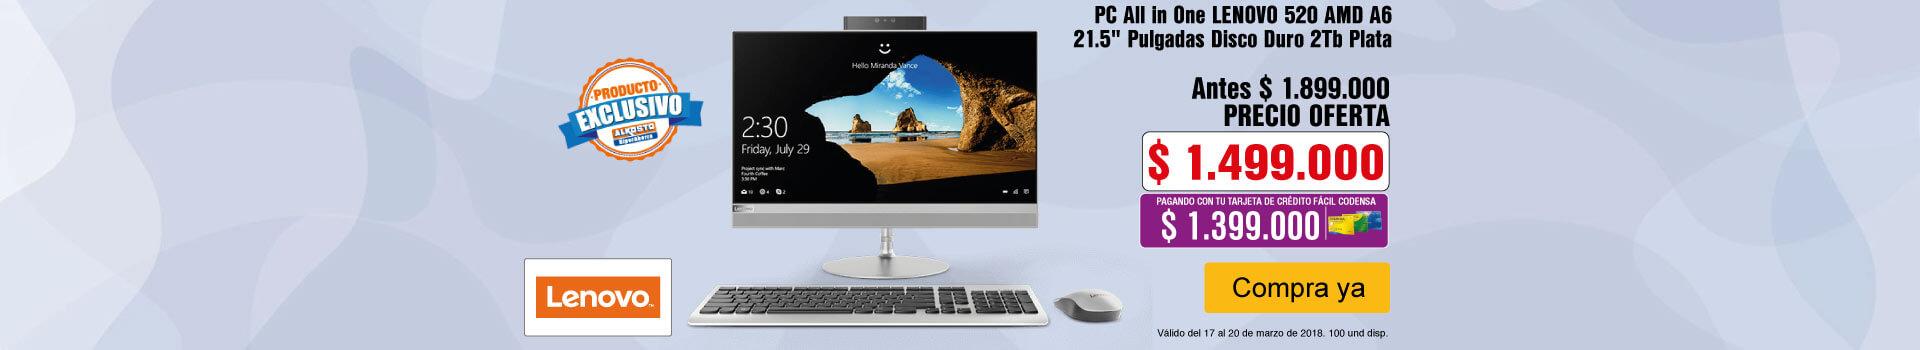 HIPER AK-KT-2-computadores-PC All in One LENOVO 520 AMD A6 21.5